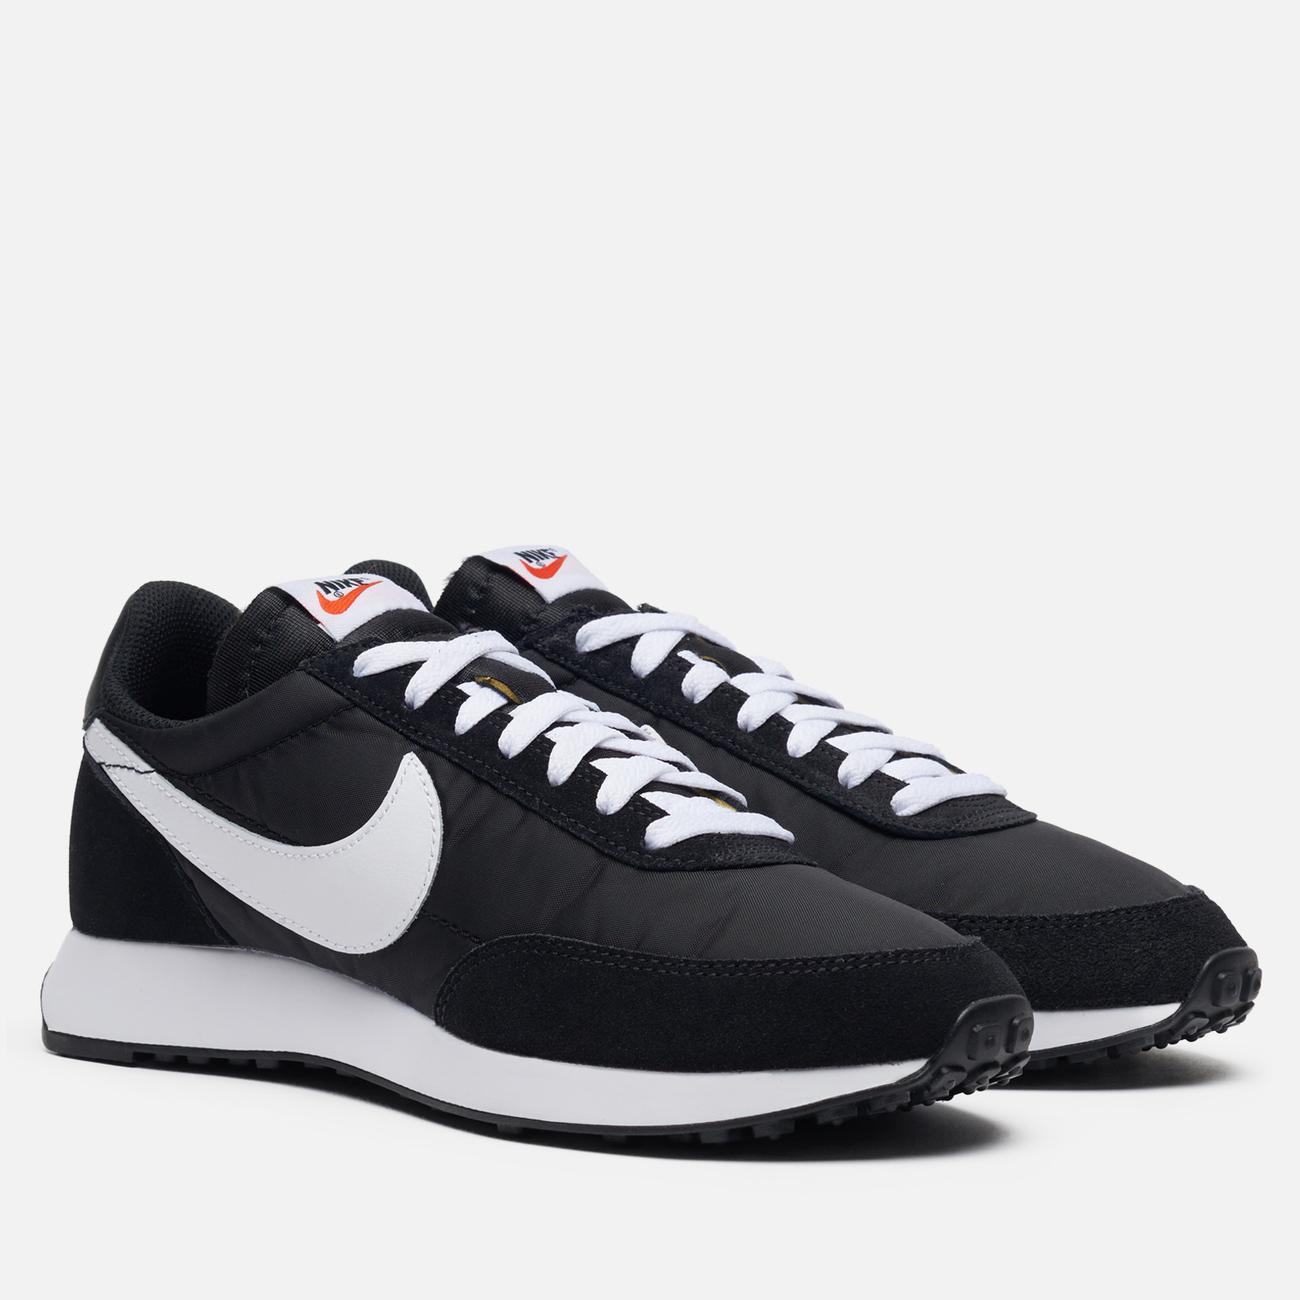 Мужские кроссовки Nike Air Tailwind 79 Black/White/Orange